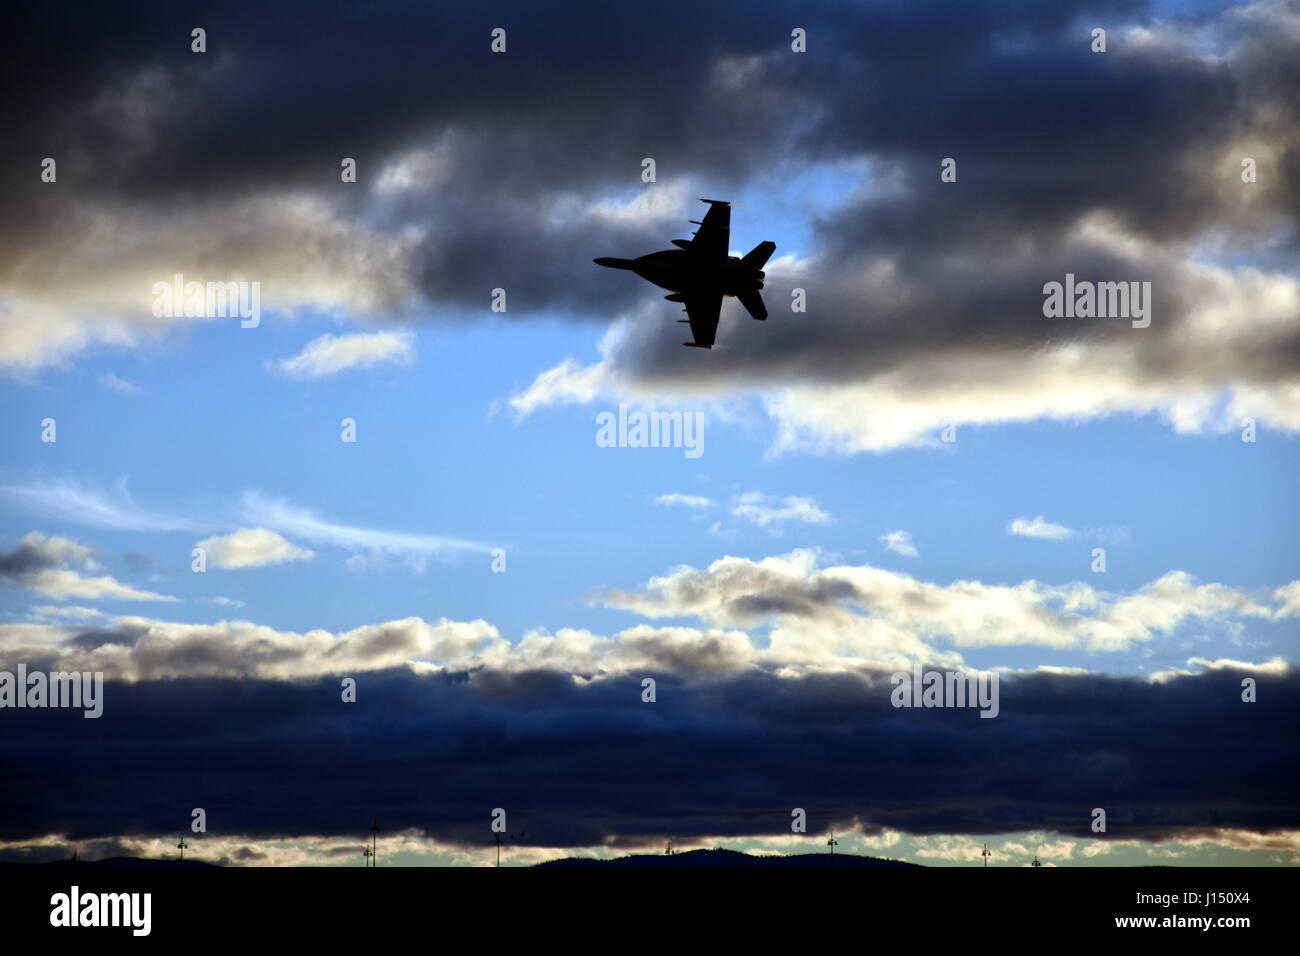 Canberra, Australia - March 18, 2017. An adrenalin rushing RAAF F/A-18F Super Hornet jet handling display at Regatta - Stock Image